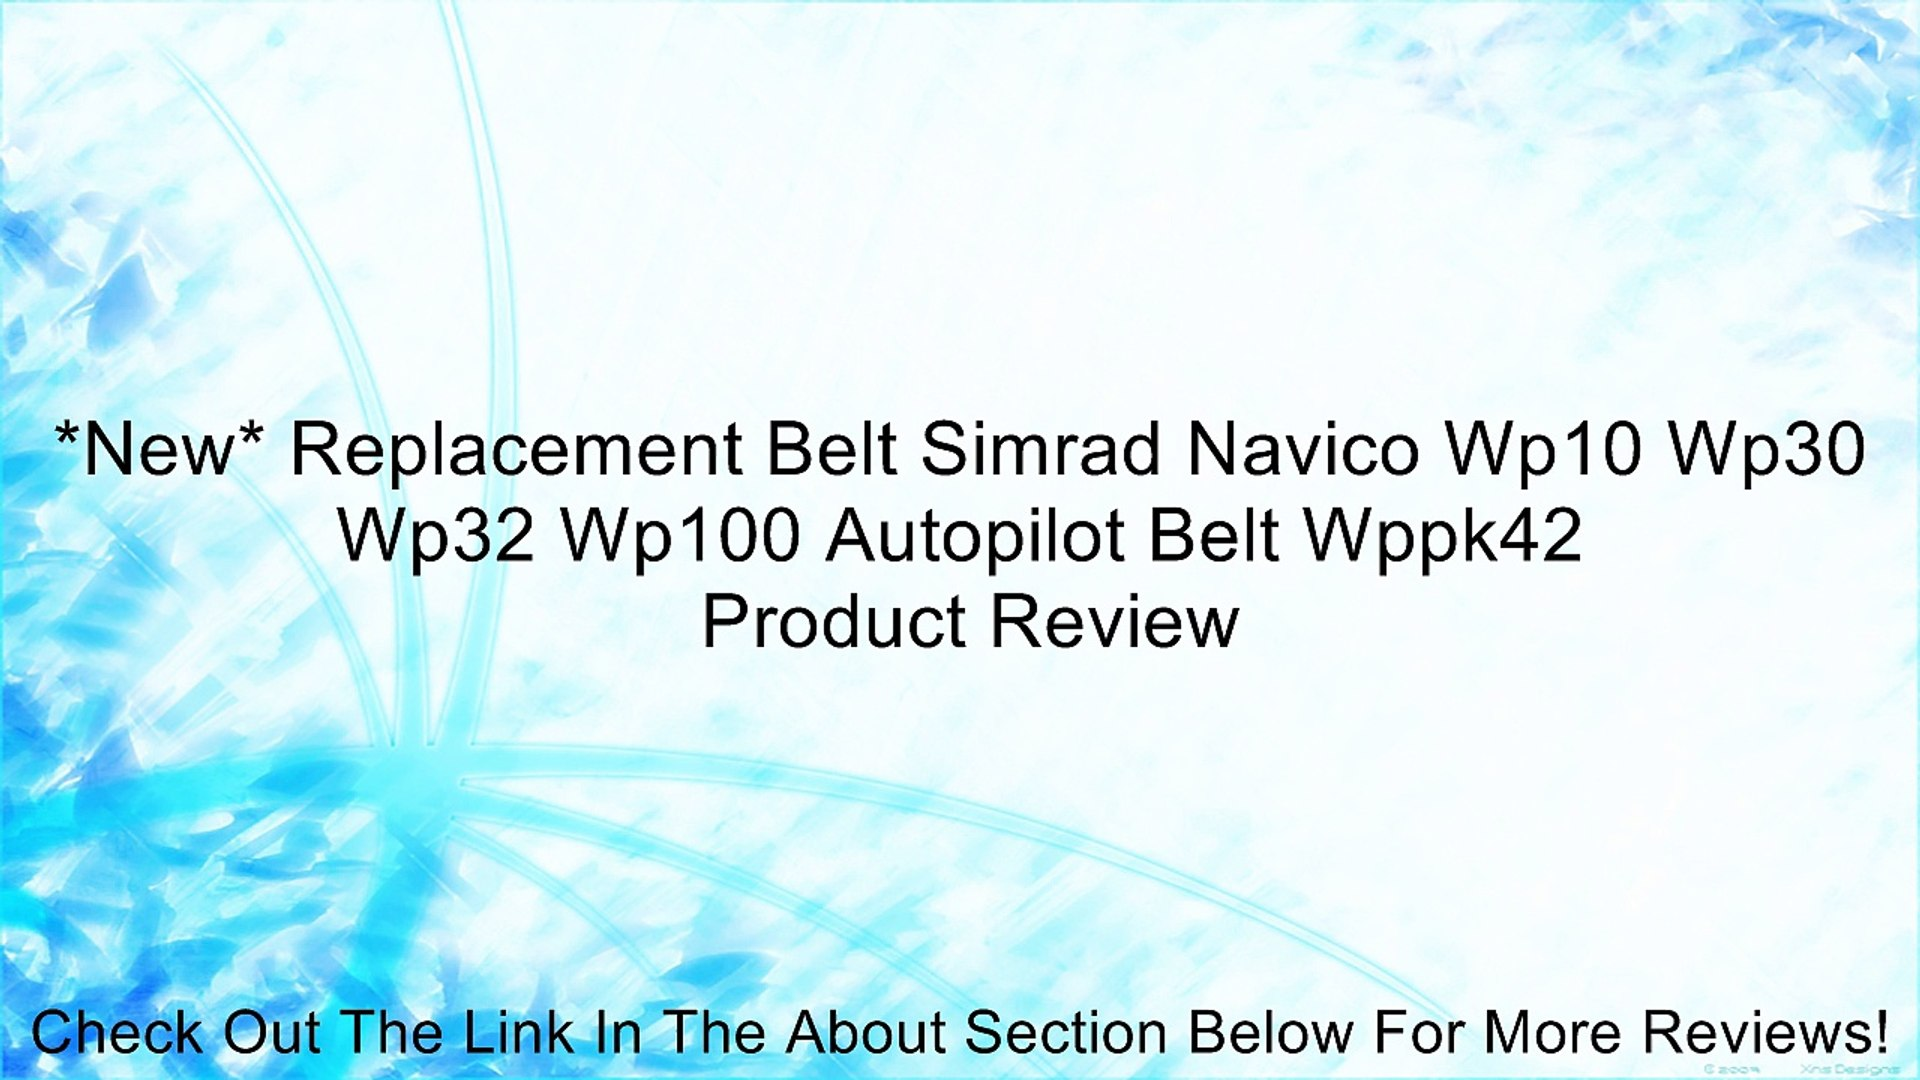 *NEW* REPLACEMENT BELT Simrad NAVICO WP10 WP30 WP32 WP100 Autopilot BELT WPPK42